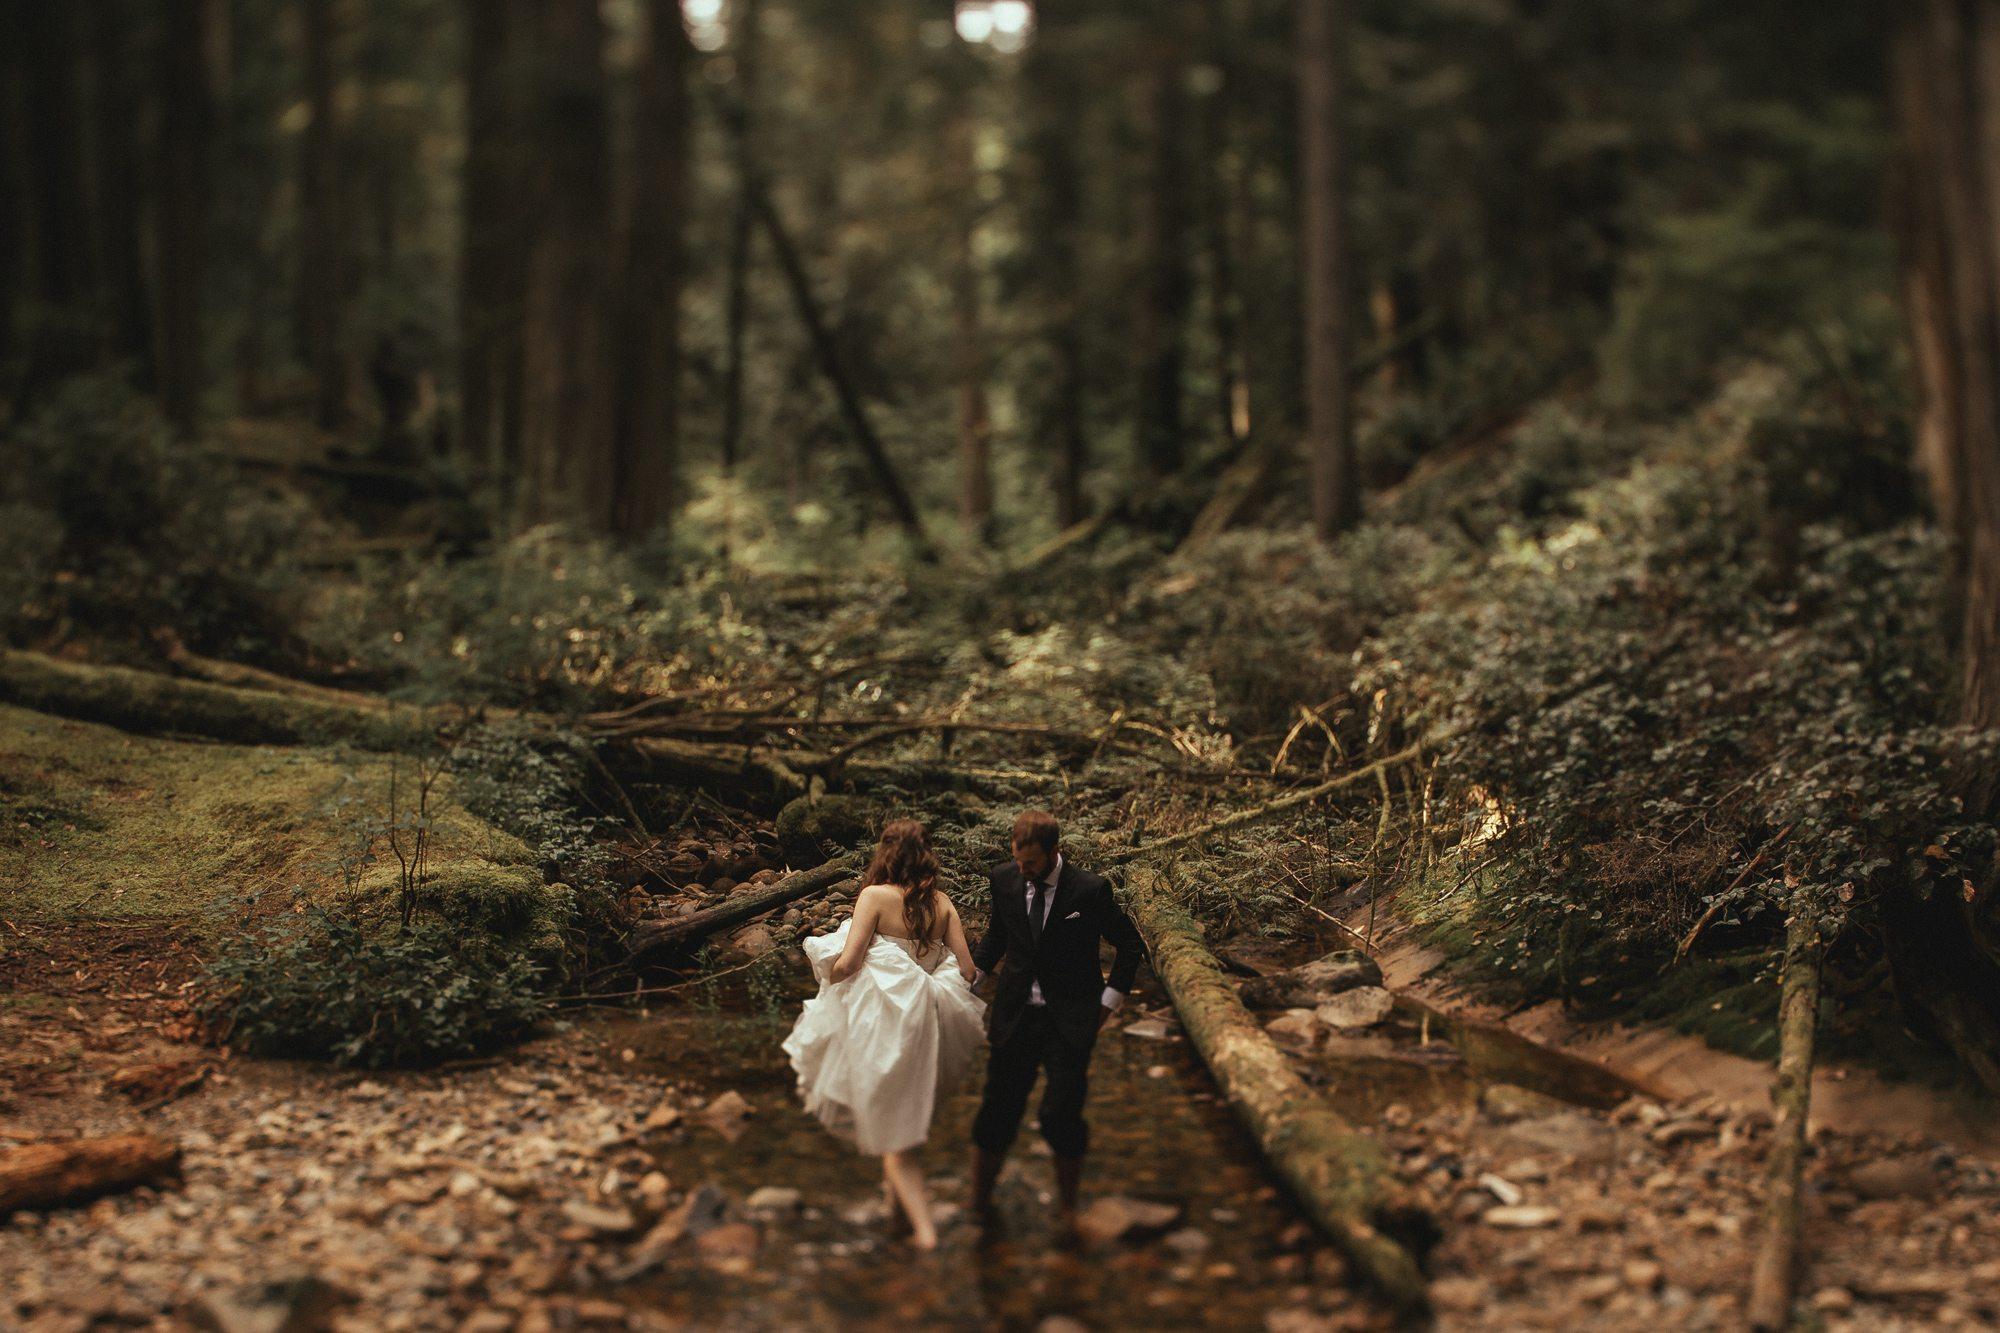 gibsons-wedding-photography-robert-devon40